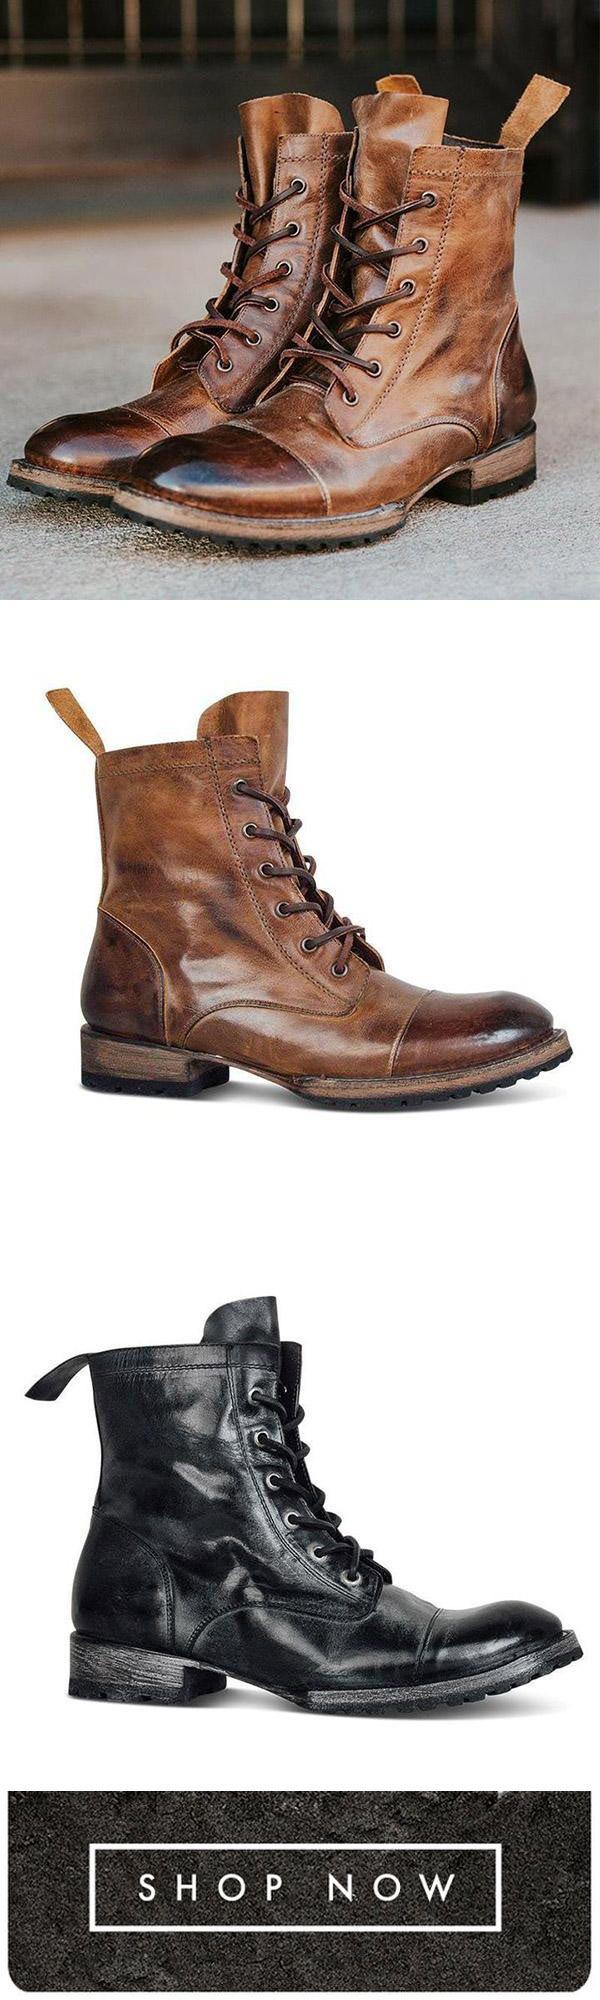 4eef2eda283ab Florychic Men Fashion Vintage Mid Boots